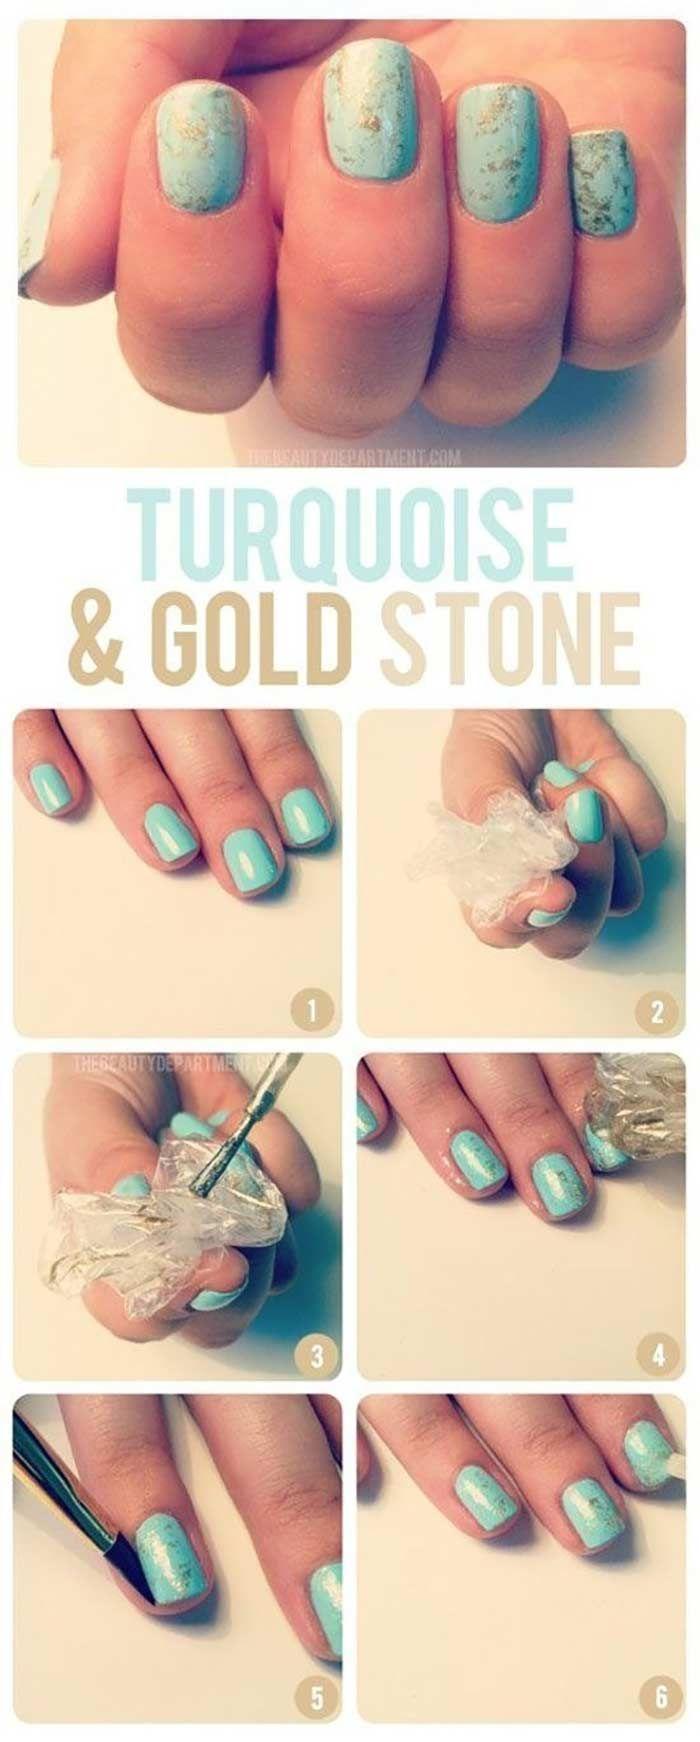 Top 60 easy nail art design tutorials for short nails 2017 60 trendy nail art designs for short nails prinsesfo Choice Image